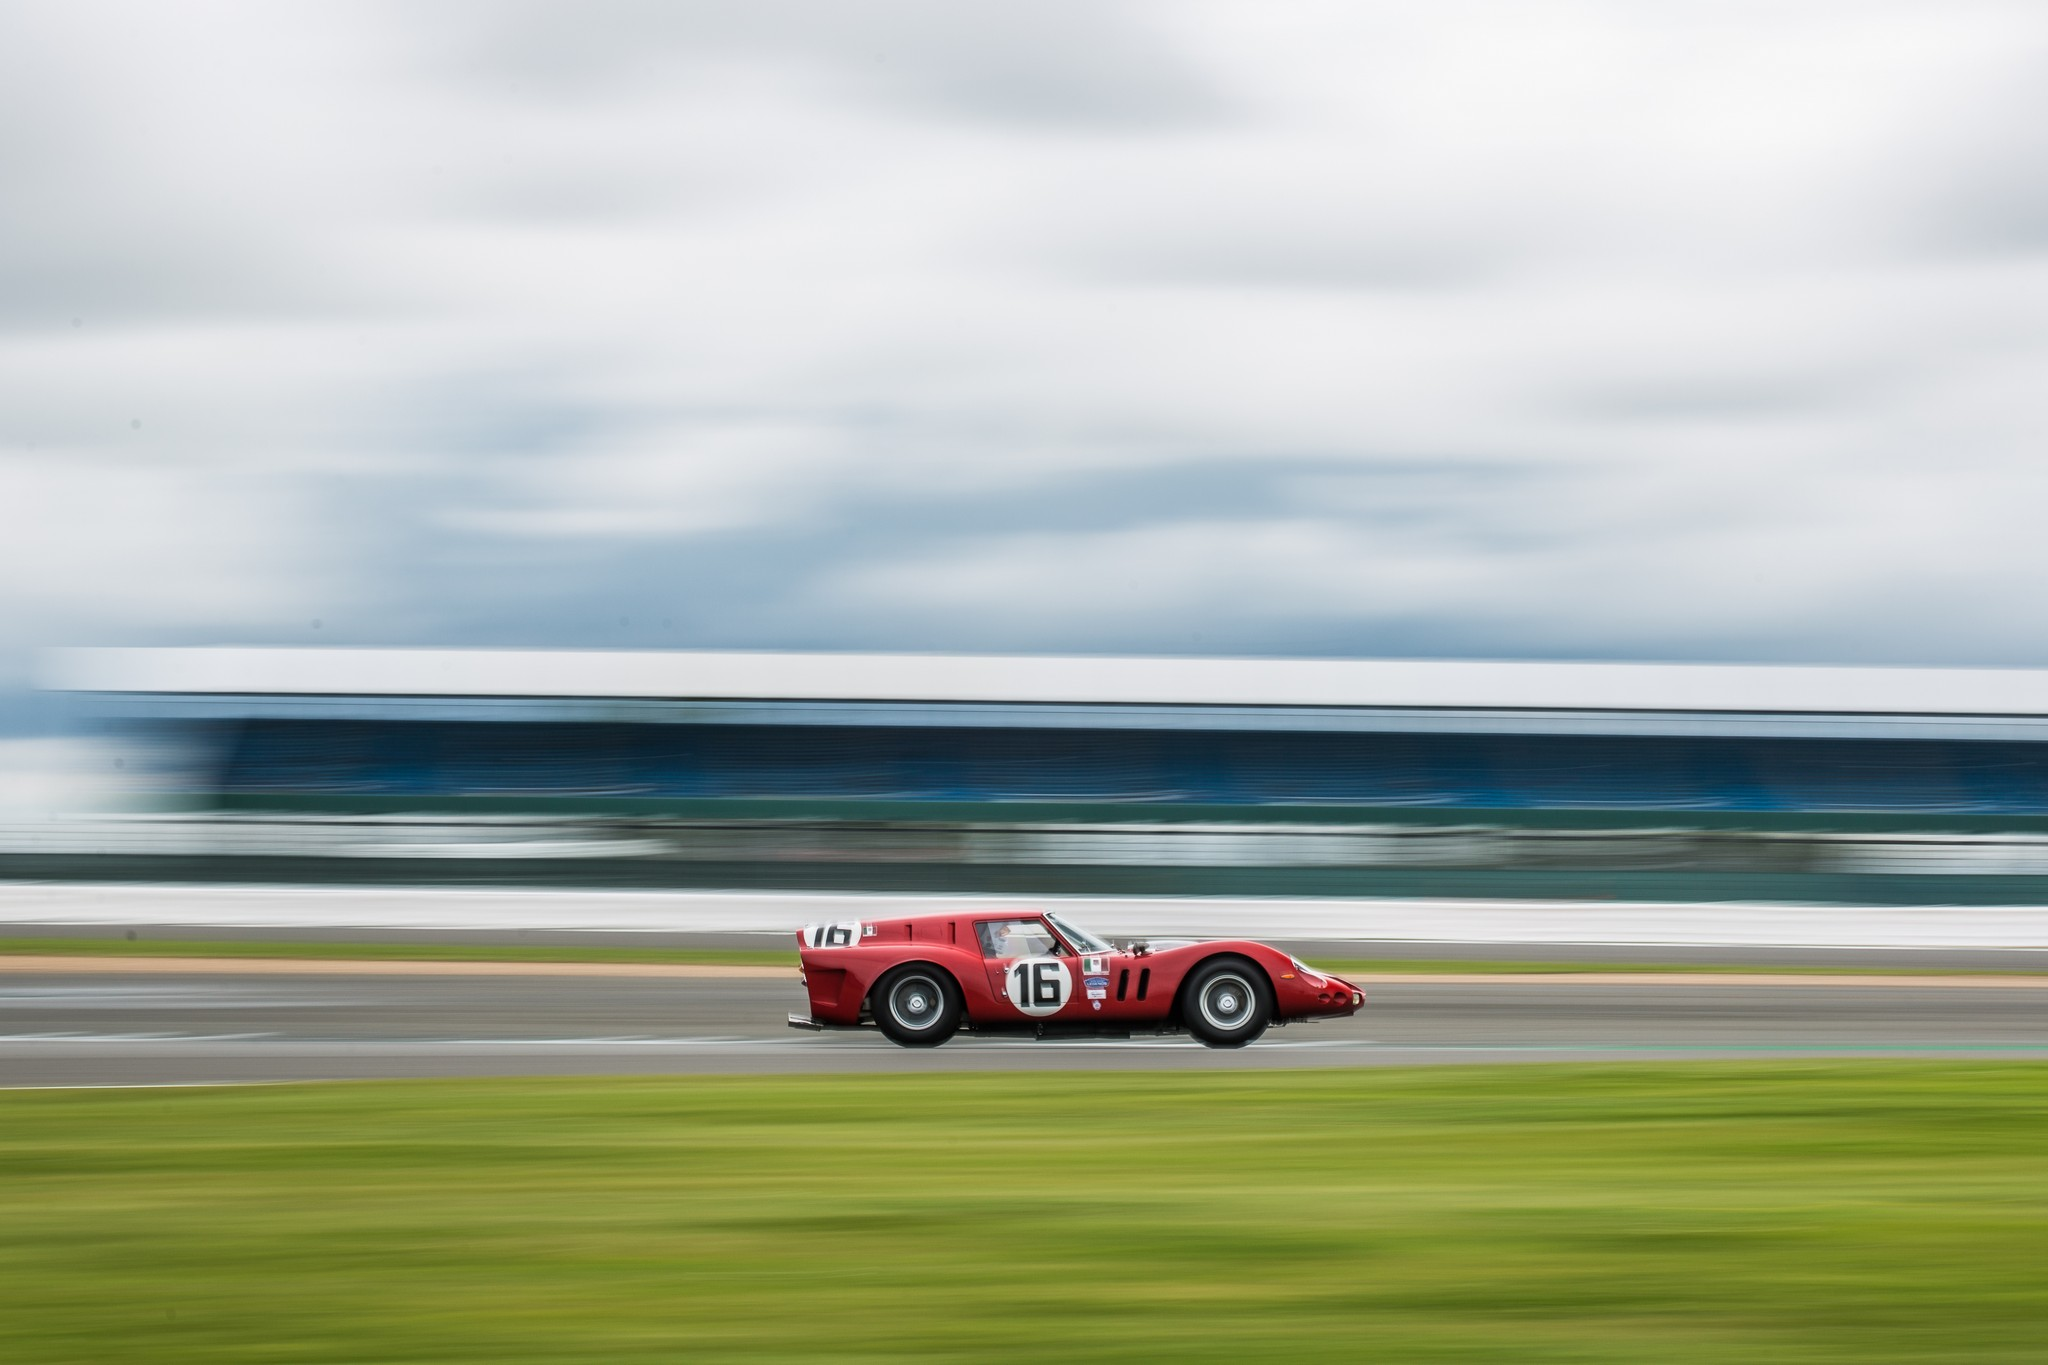 The race winning Ferrari 250 GT Breadvan